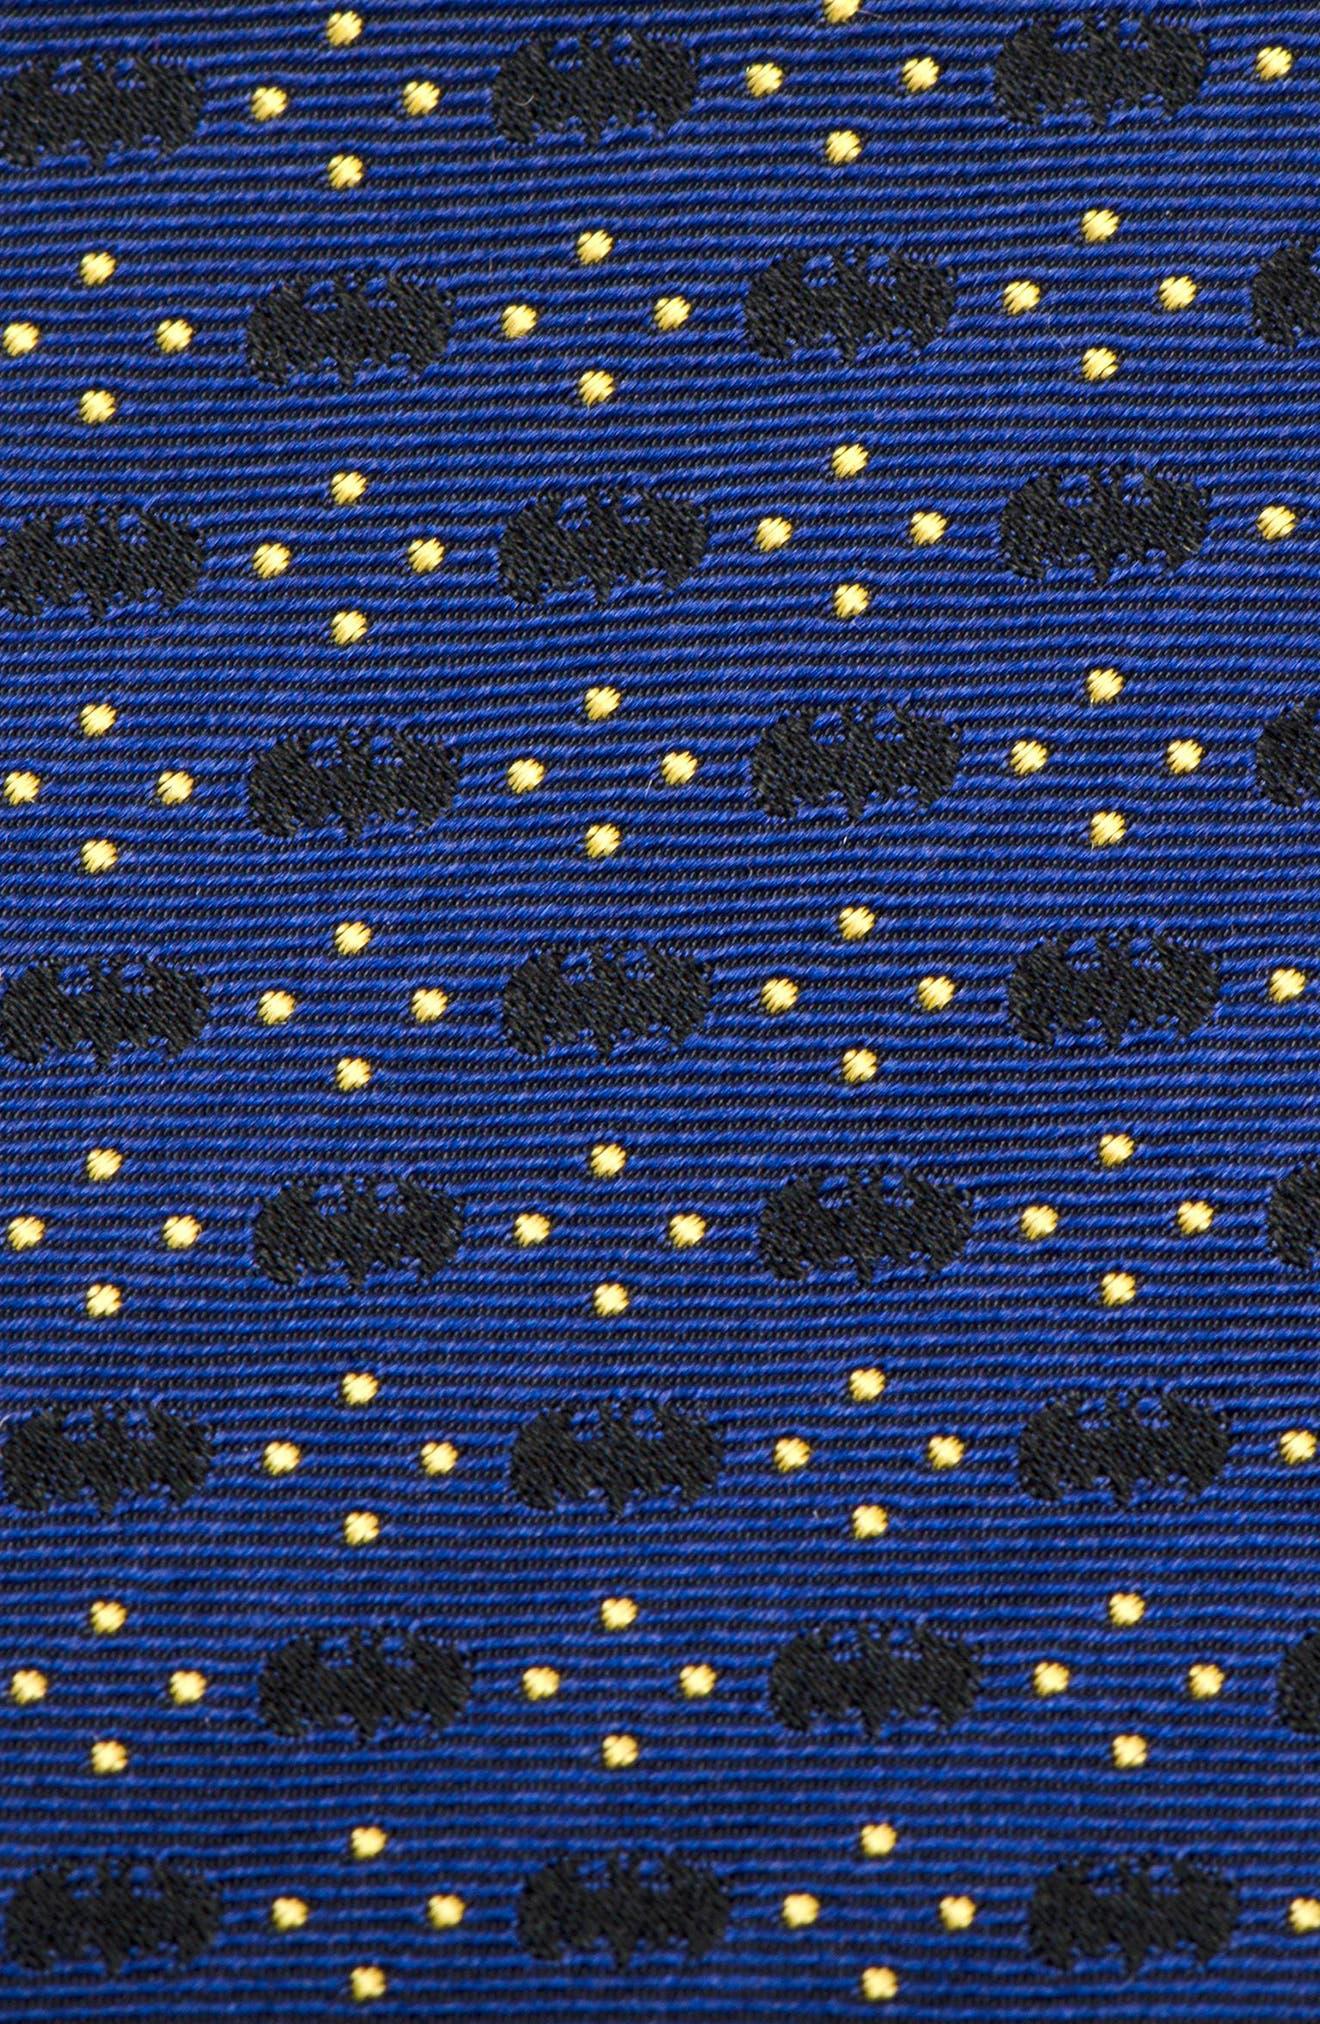 Batman Diamond Dot Silk Tie,                             Alternate thumbnail 3, color,                             410